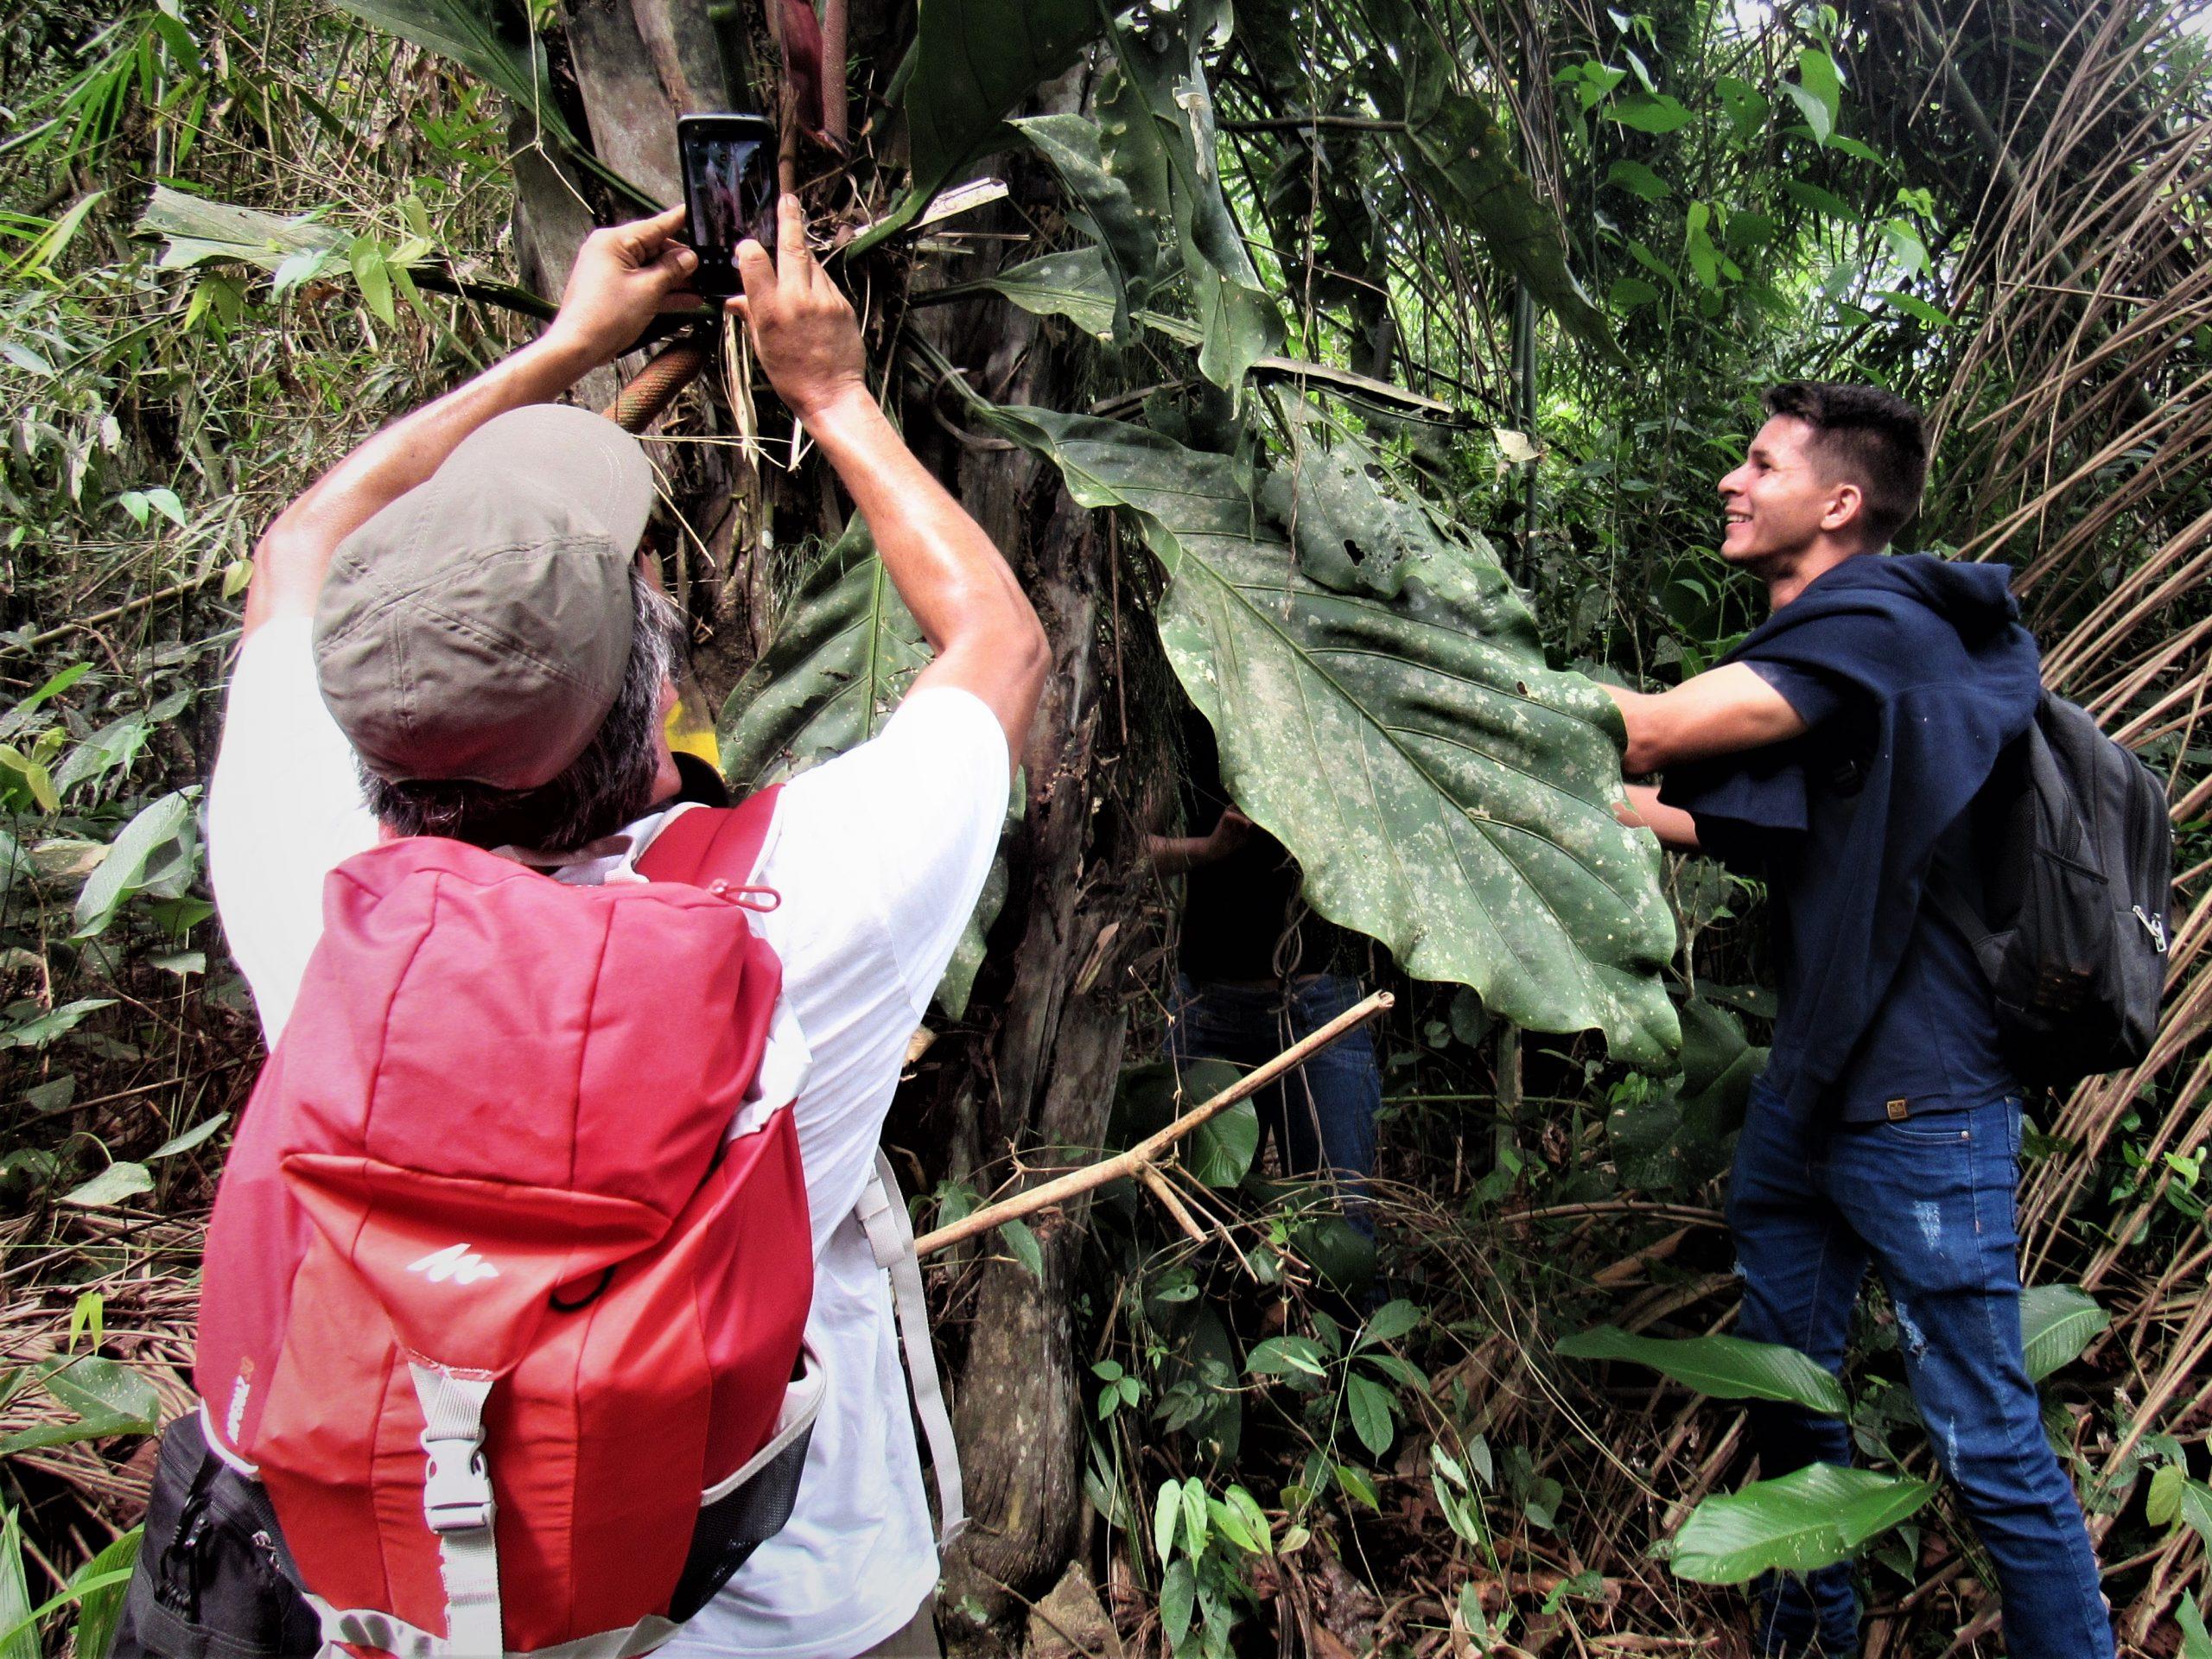 Desafio da Natureza Urbana é realizado em Rio Branco respeitando o isolamento social